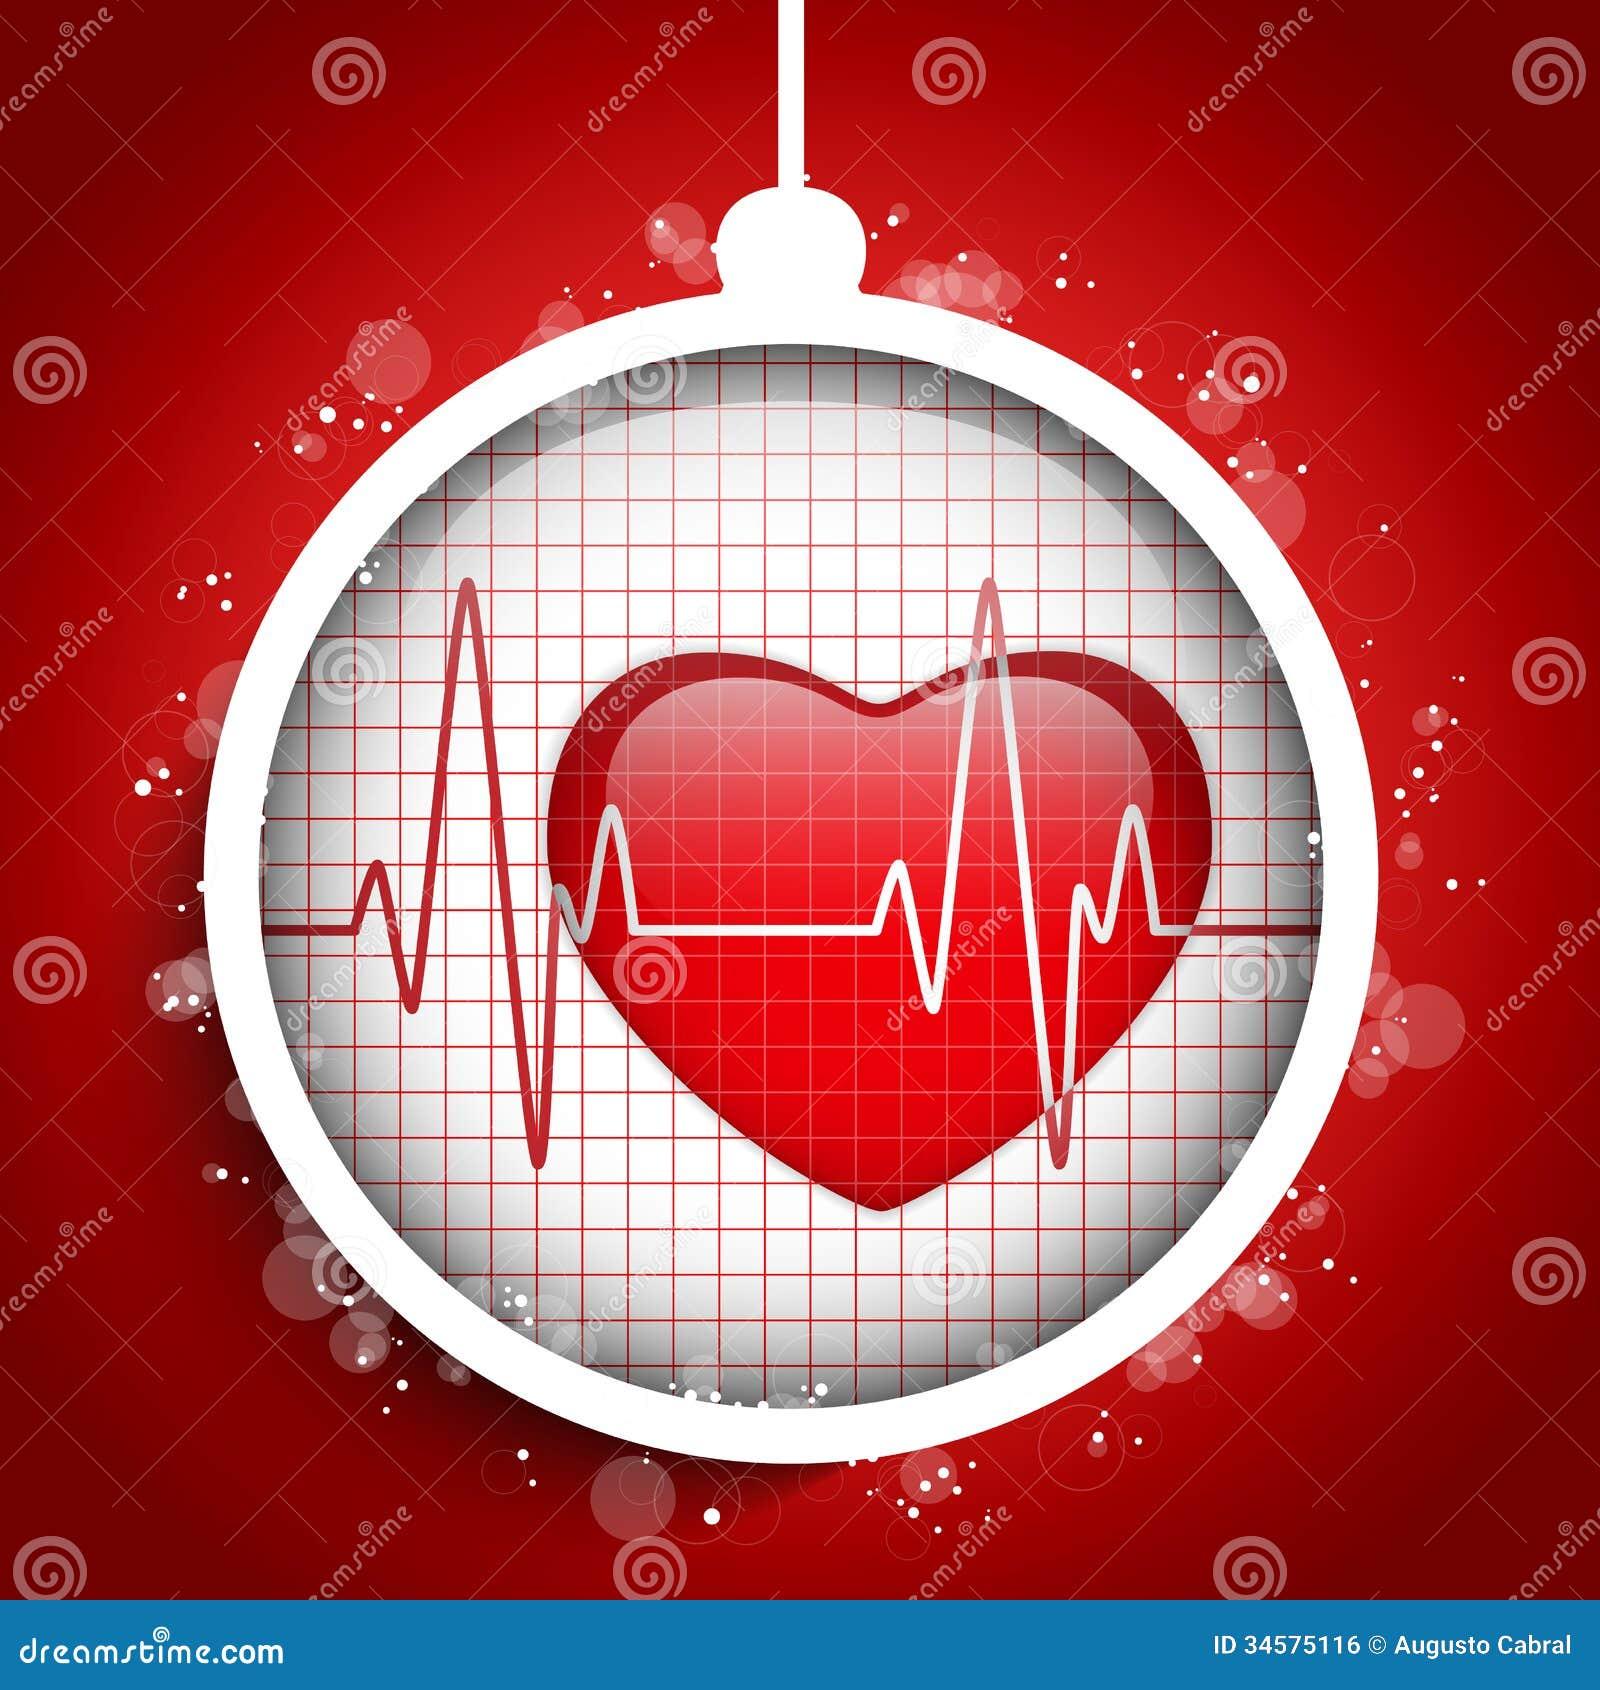 Vrolijke Kerstmis Arts Hospital Heart Ball